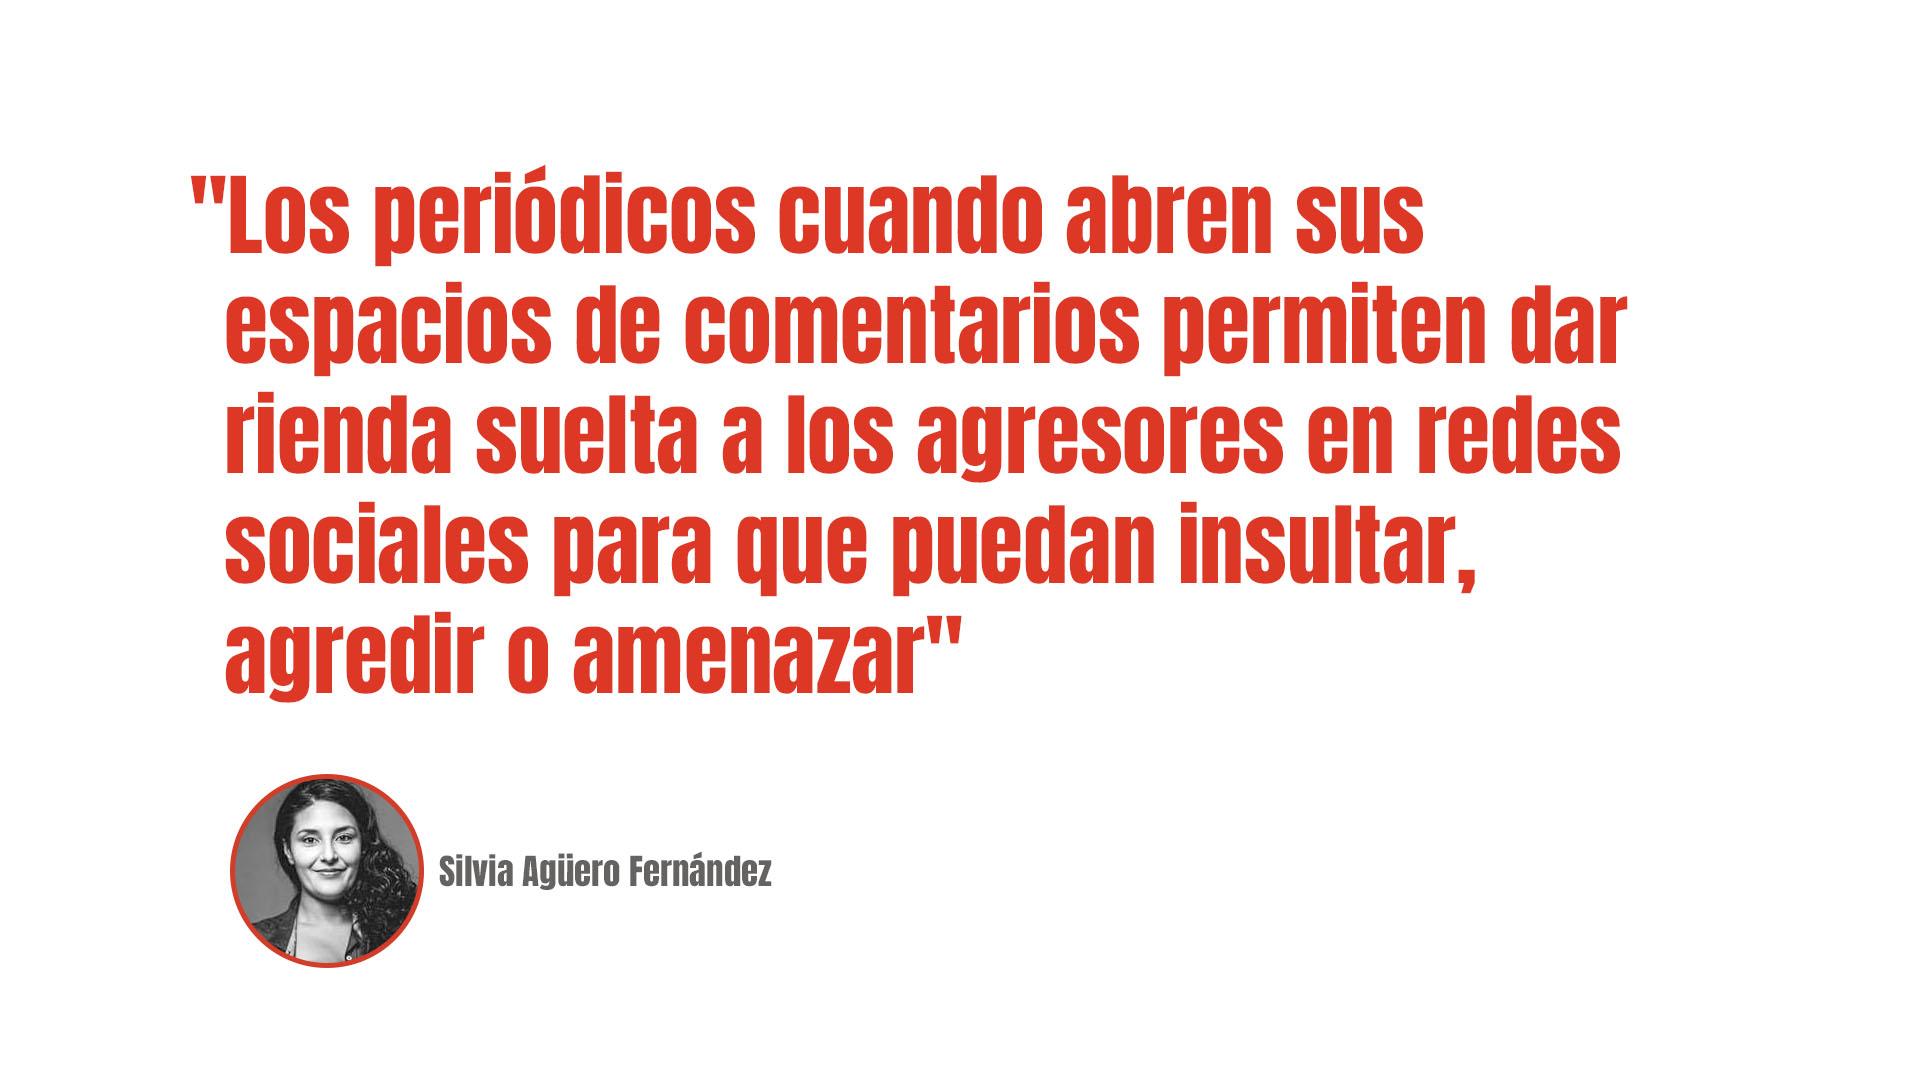 Silvia Agüero Fernández: Antigitanismo patriarcal